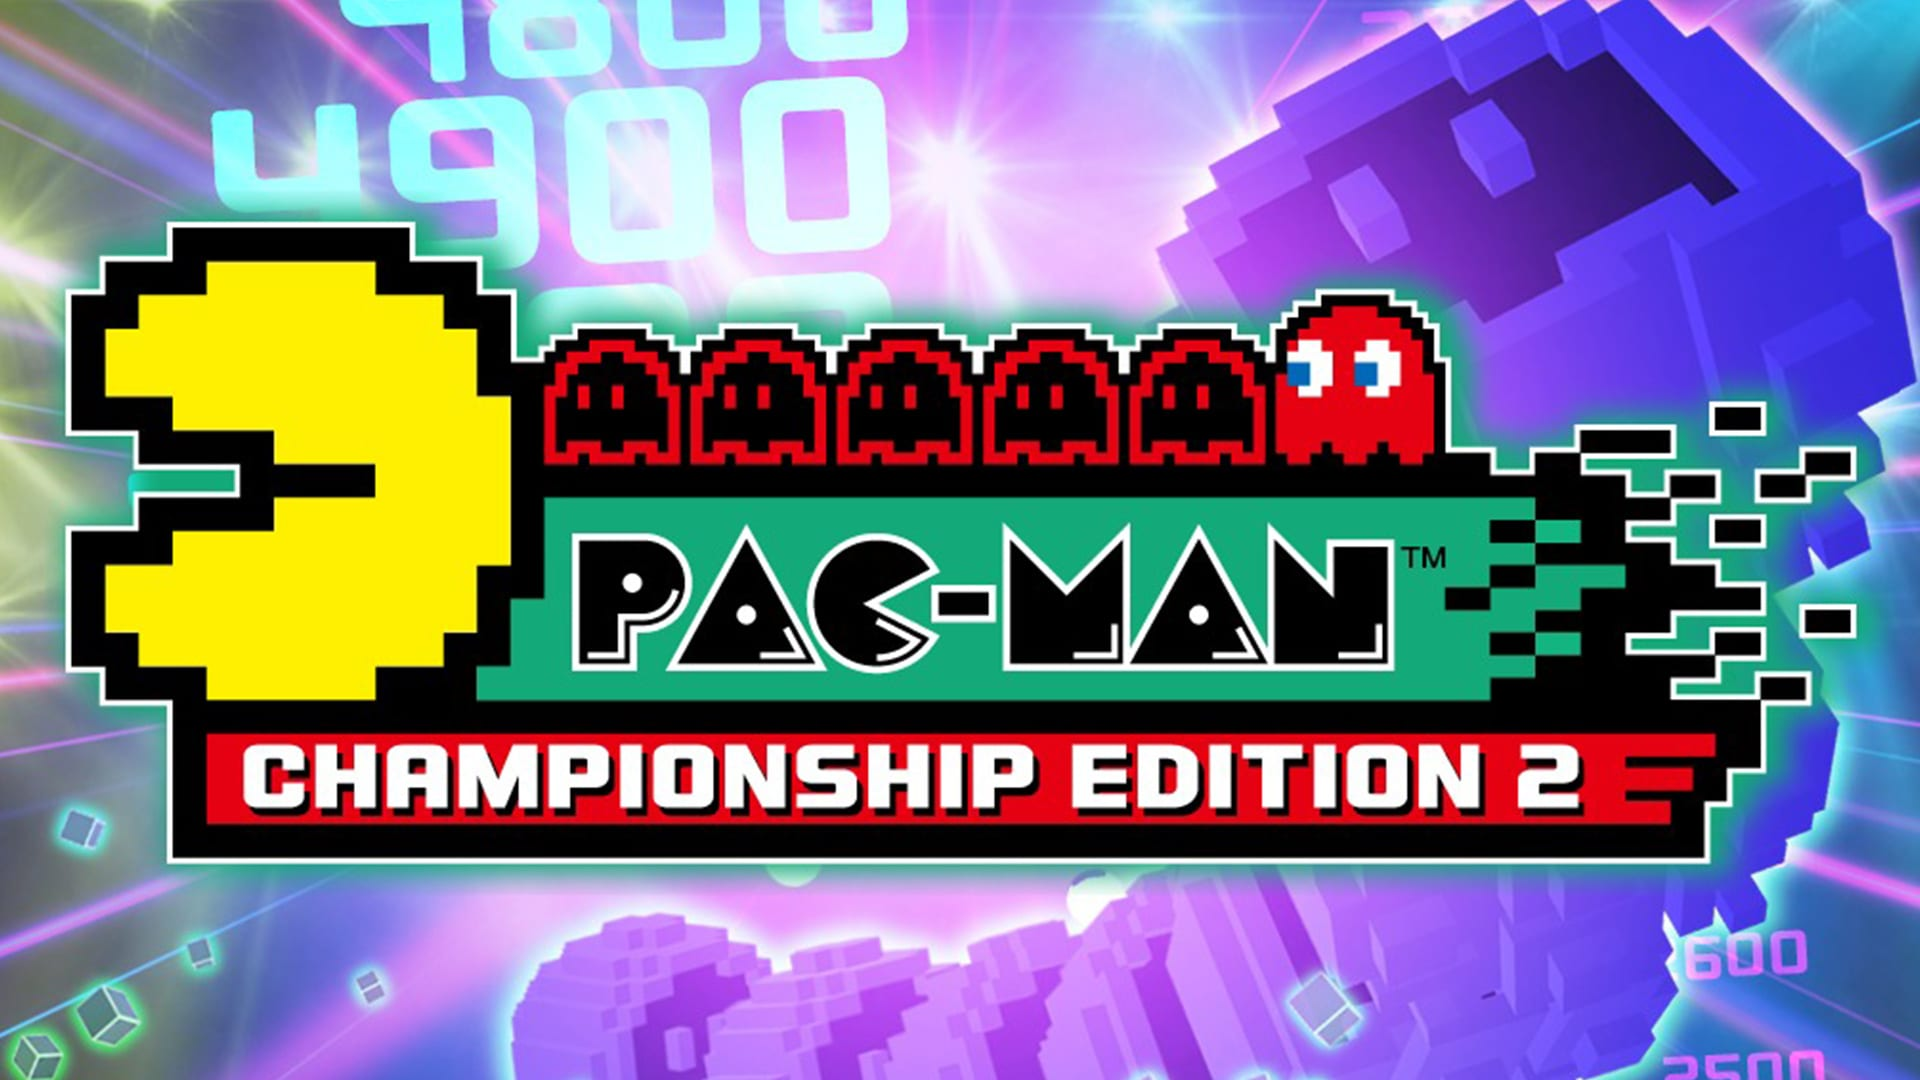 Pac-Man Championship Edition 2 Free